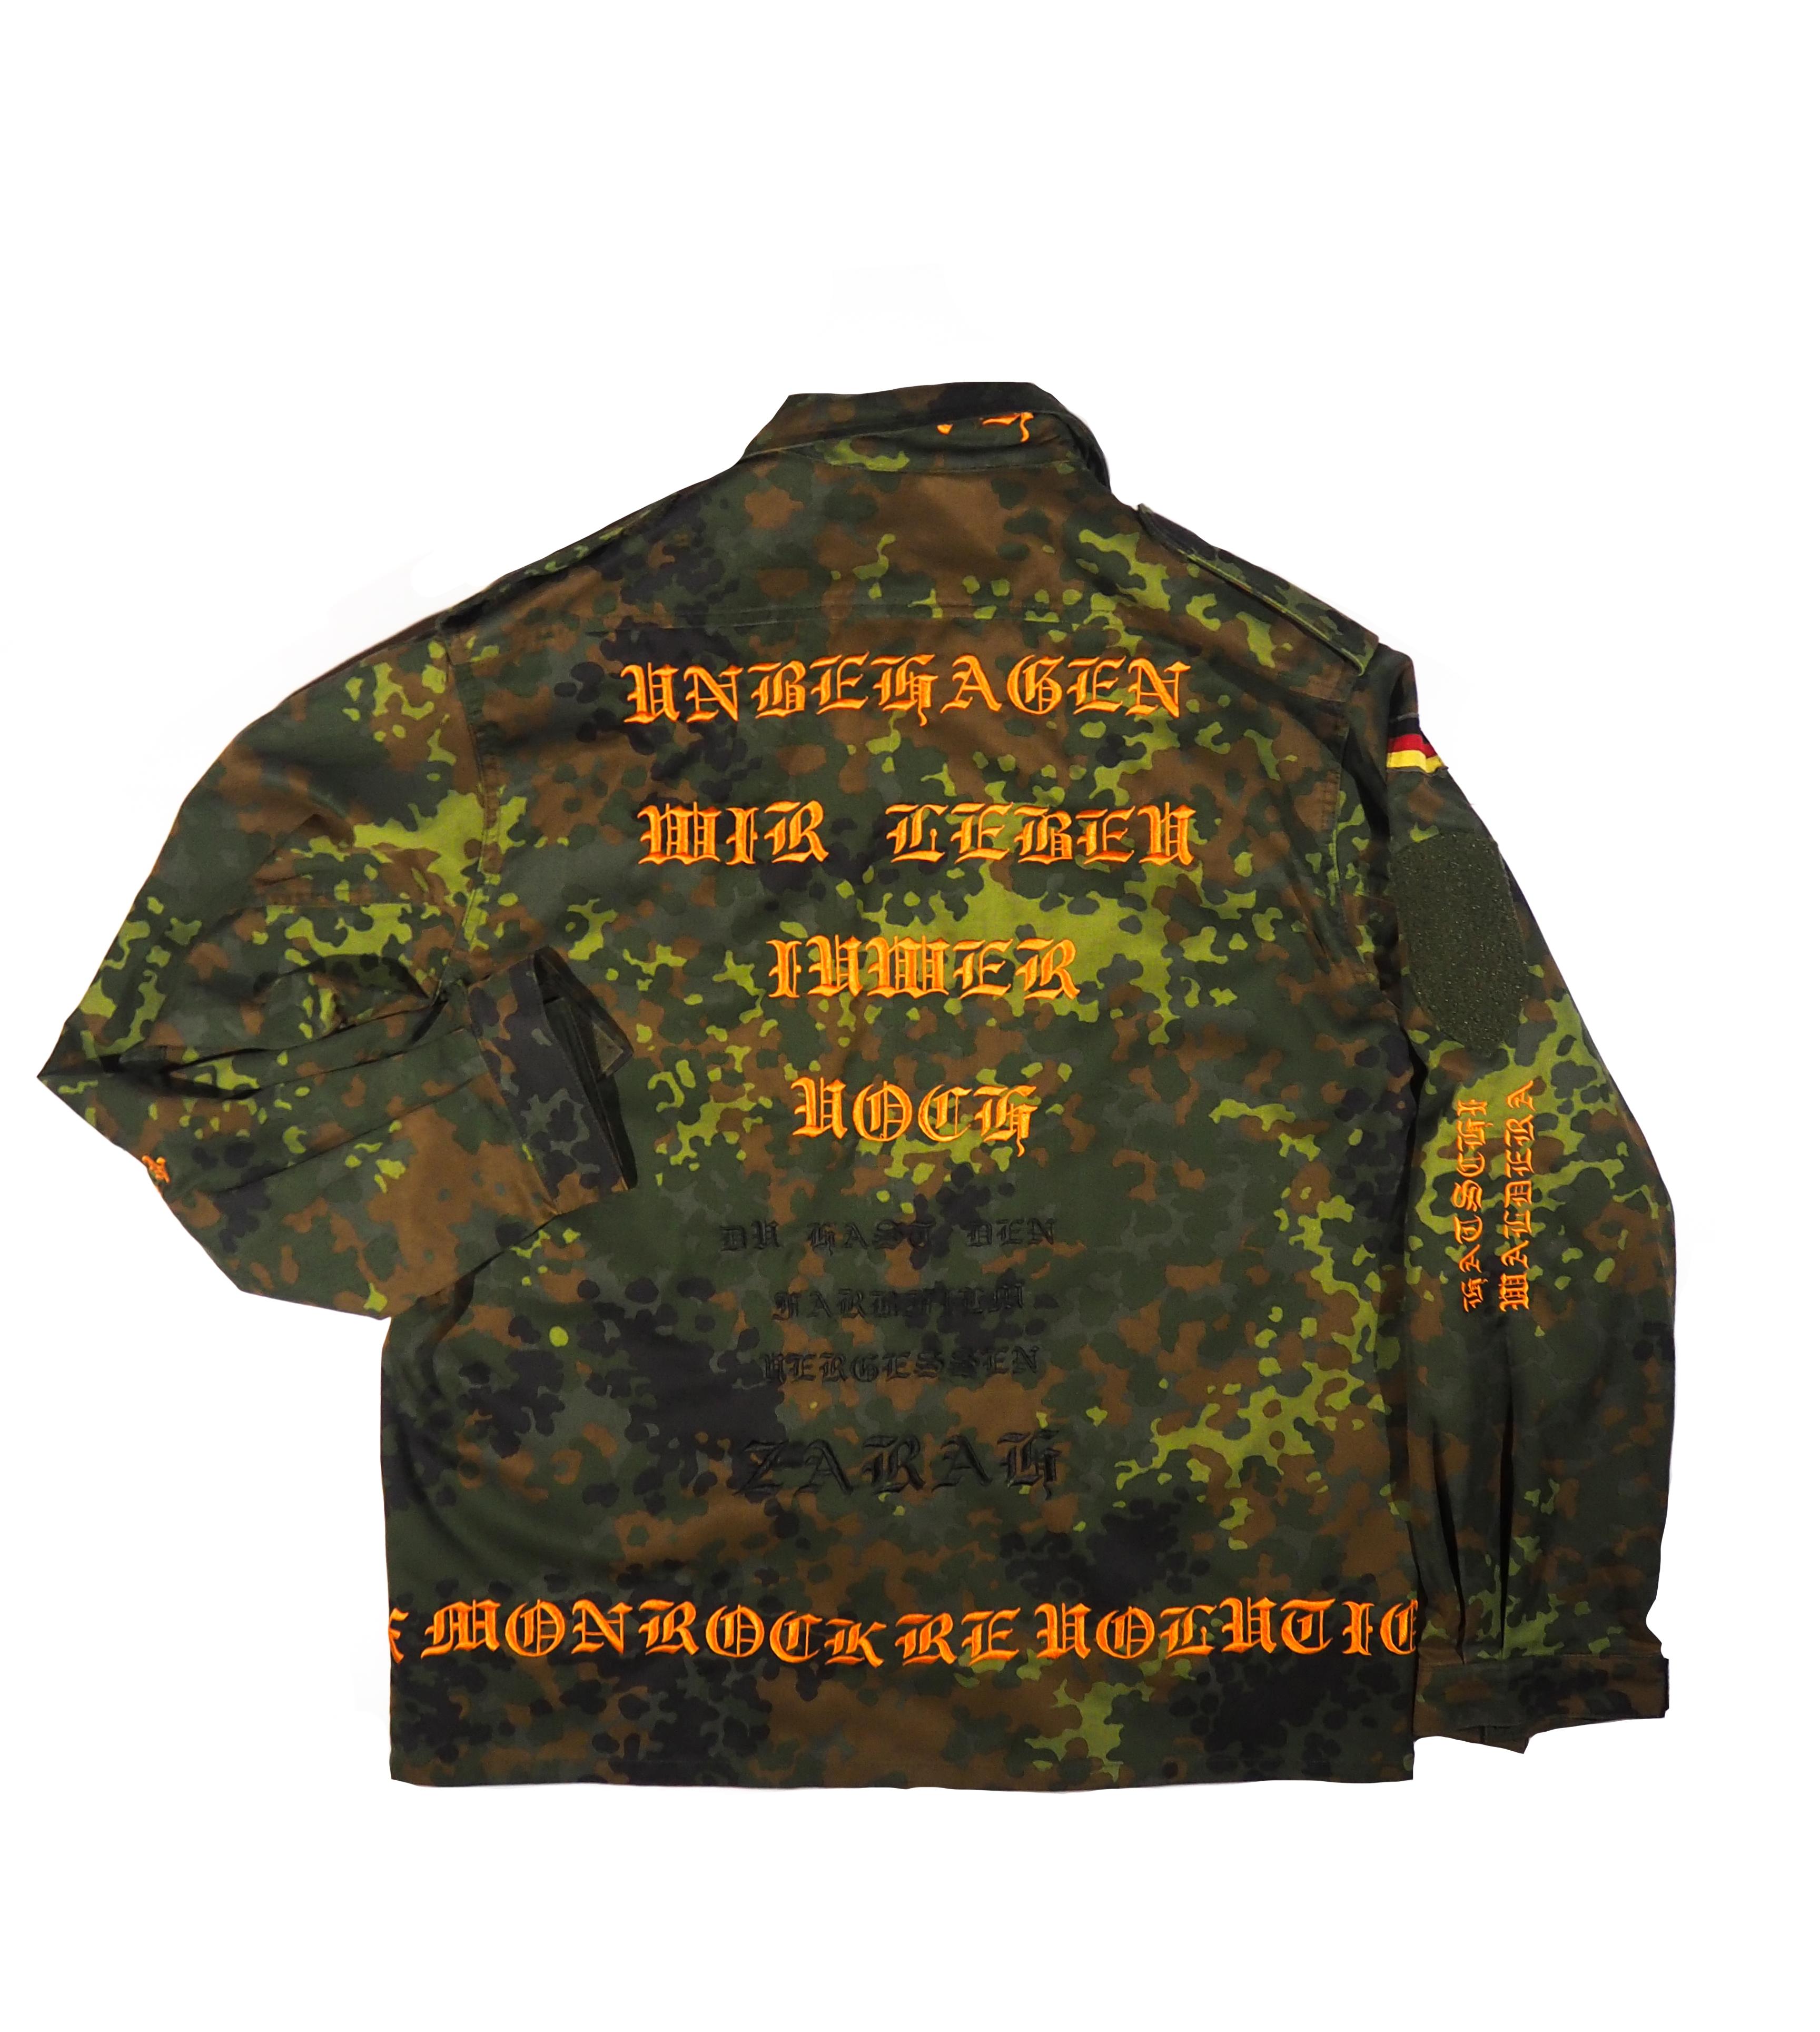 b09bded70 Chaqueta militar Nina Hagen